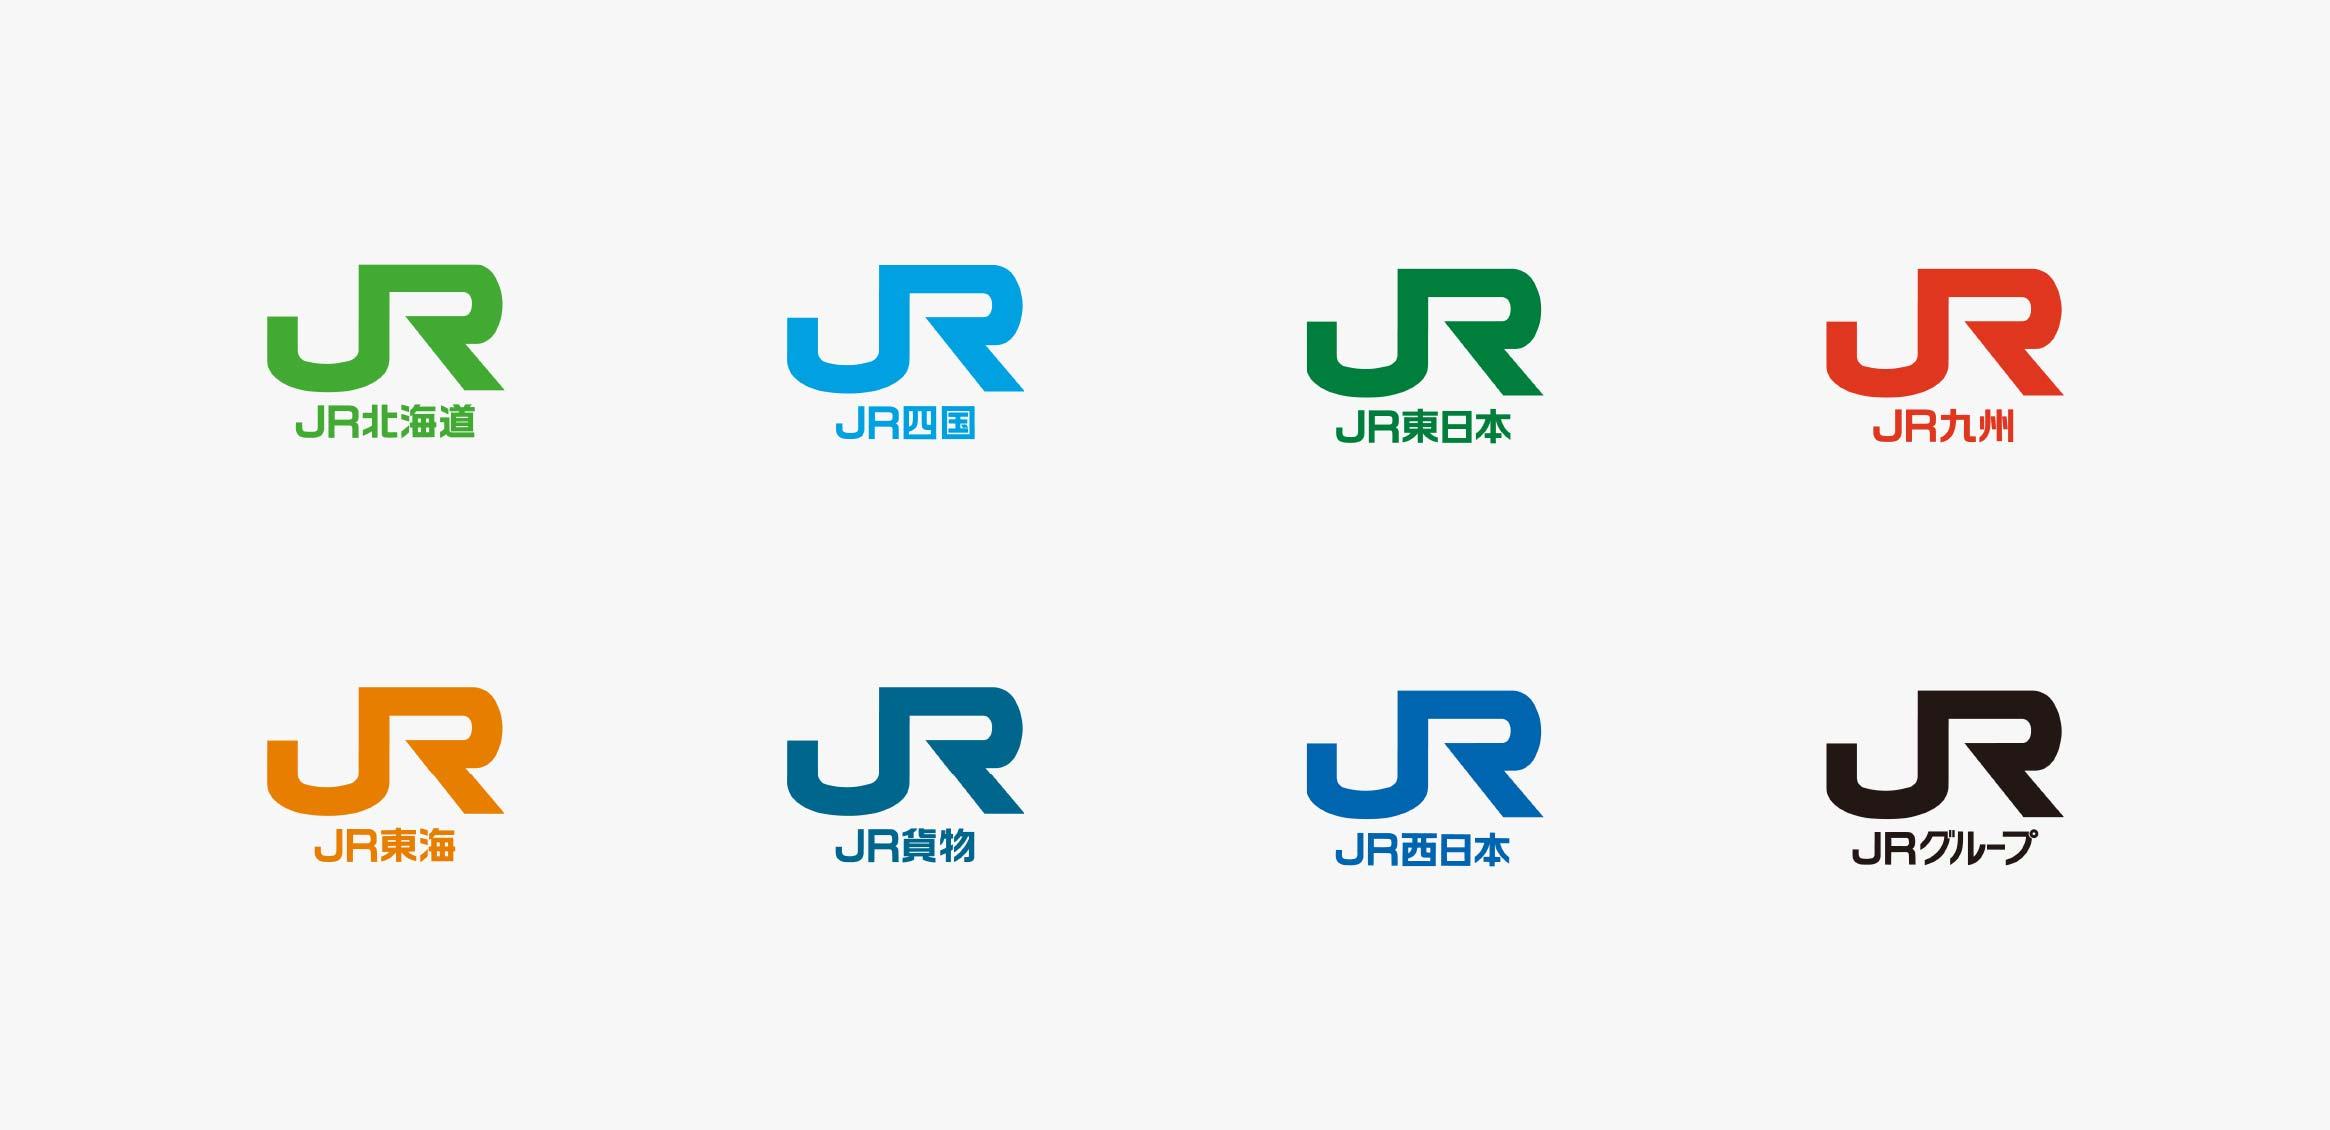 JRグループ CIデザイン1枚目